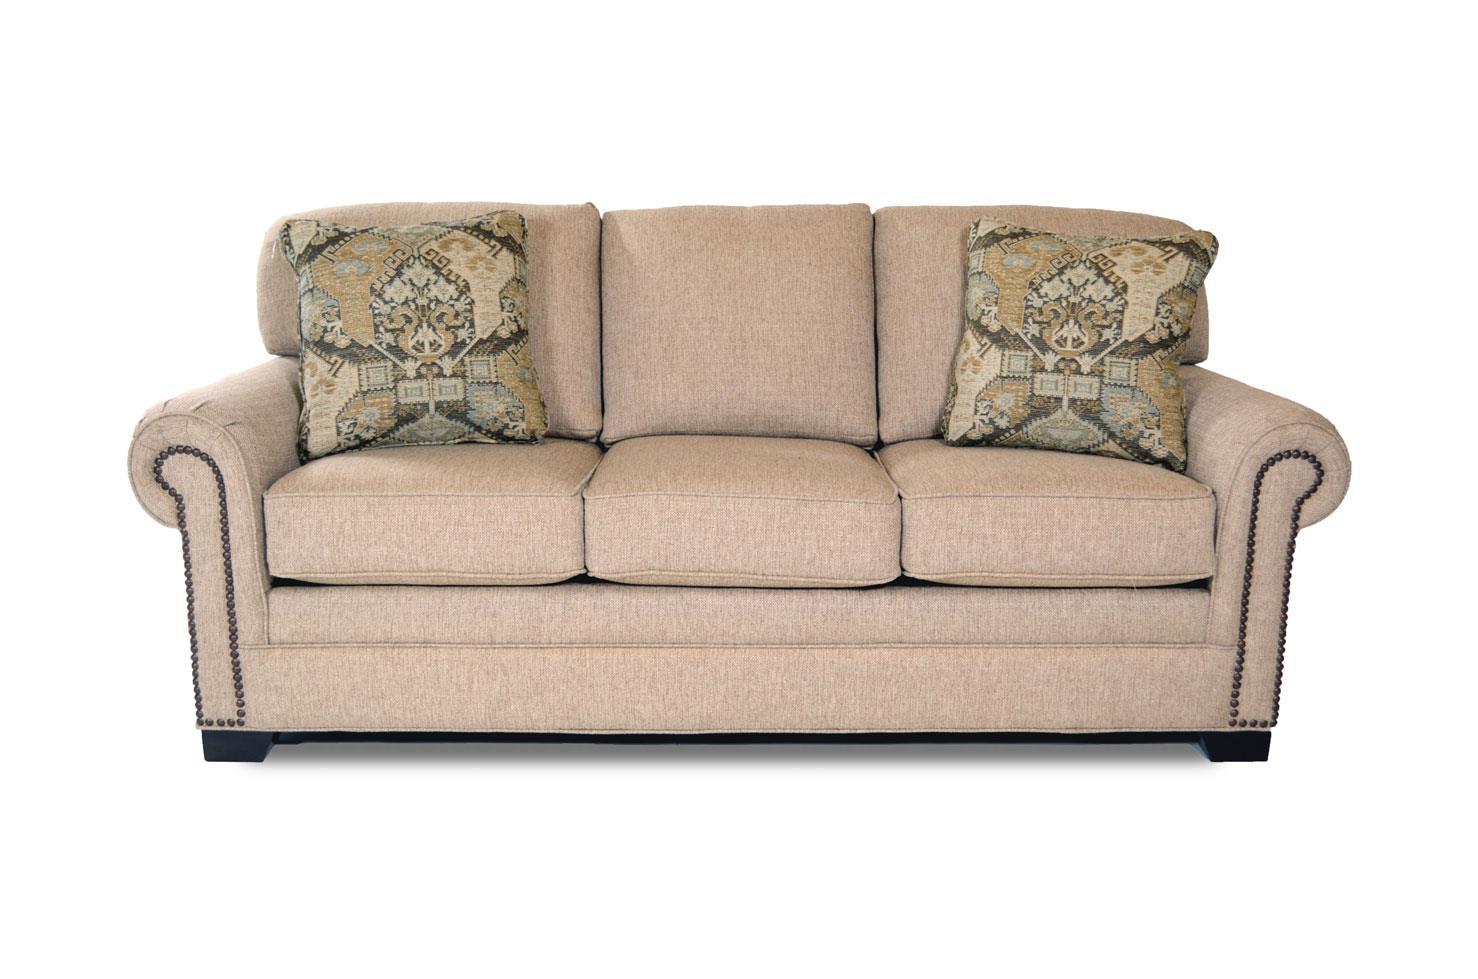 Craftmaster 756500 Sugarshack Sofa - Item Number: 756550 SUGARSHACK-12 HAWTHORNE-21